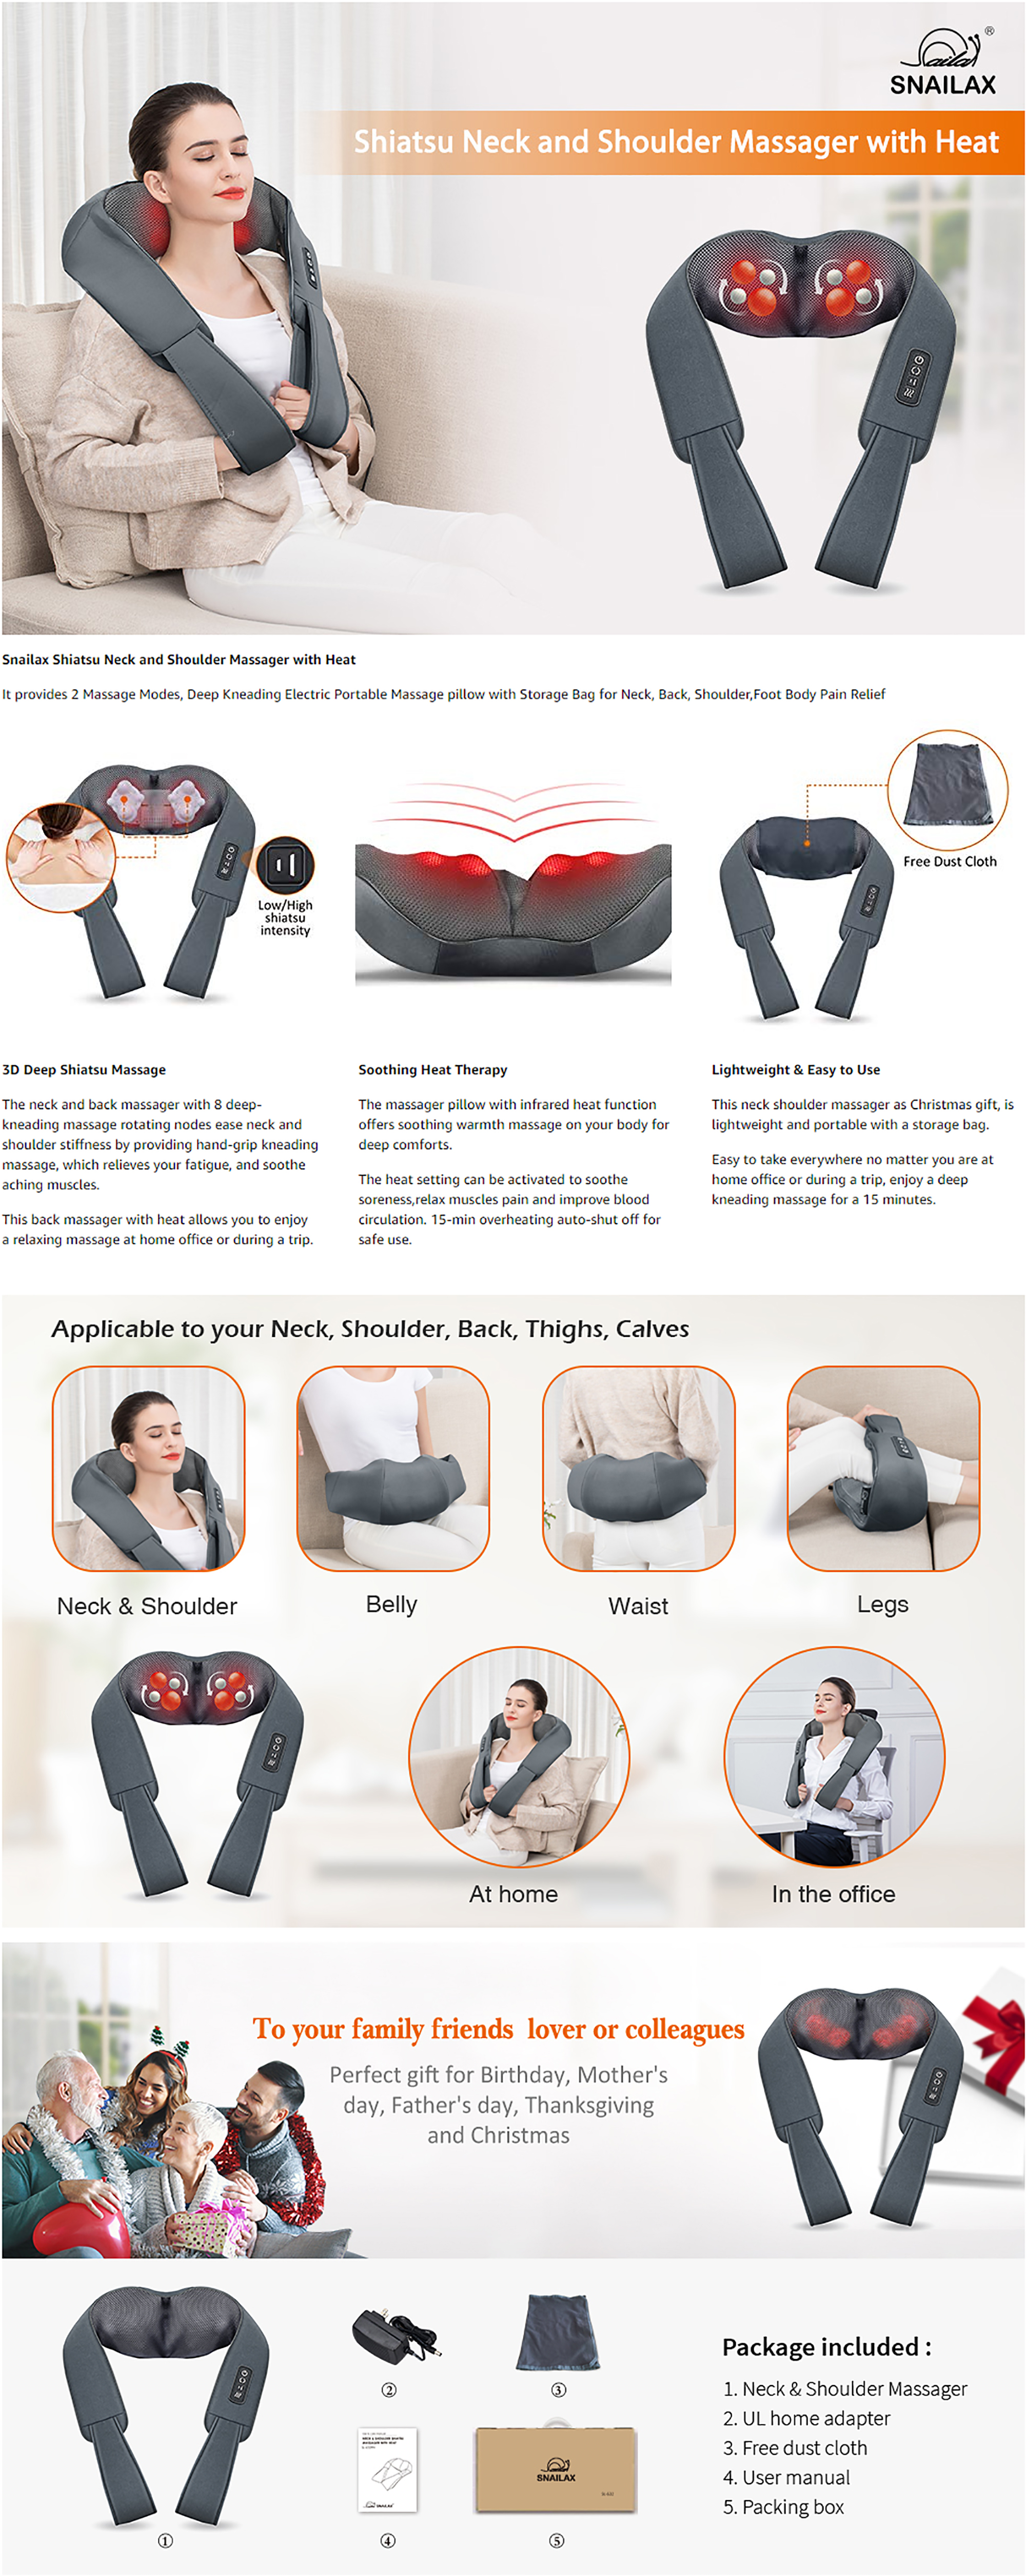 Snailax Electric Shiatsu Neck & Shoulder Massager Features